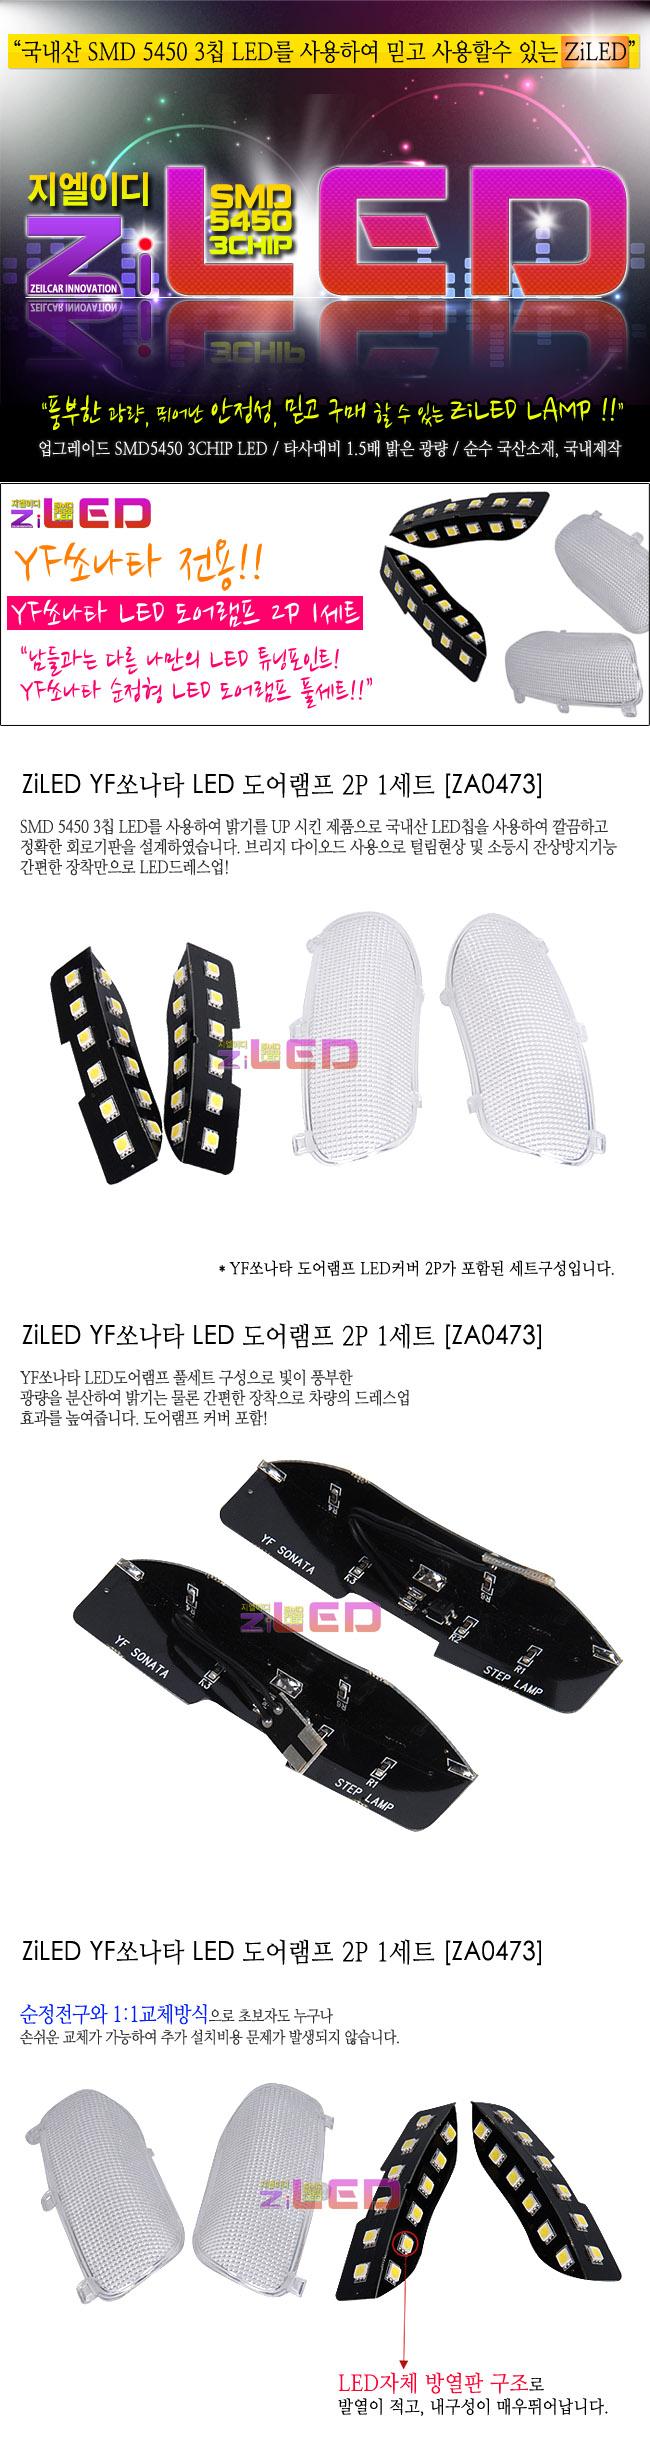 [ZiLED] YF소나타 LED 도어램프 [ZA0473]